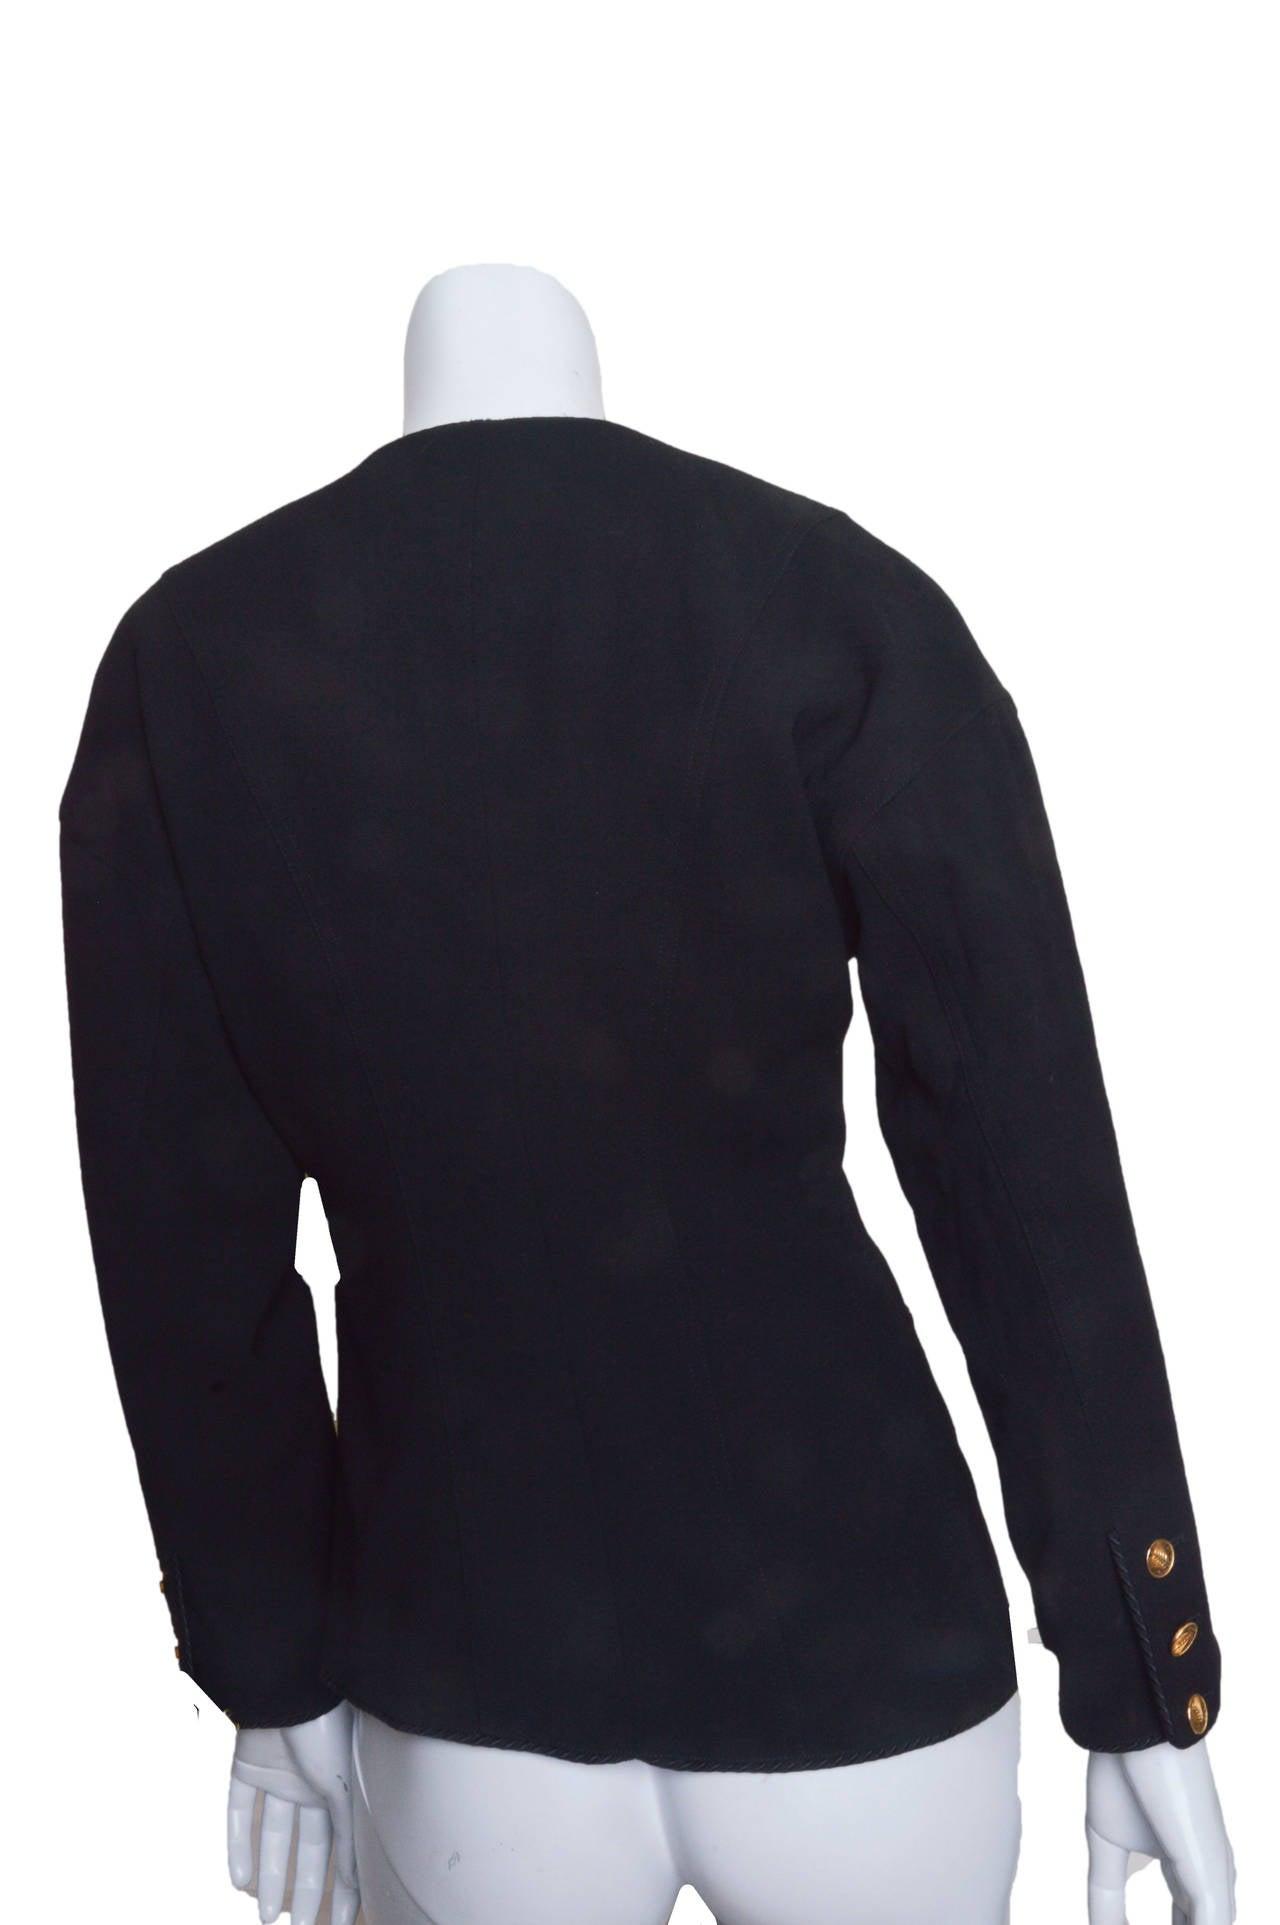 Women's Chanel Black Asymmetrical Jacket For Sale